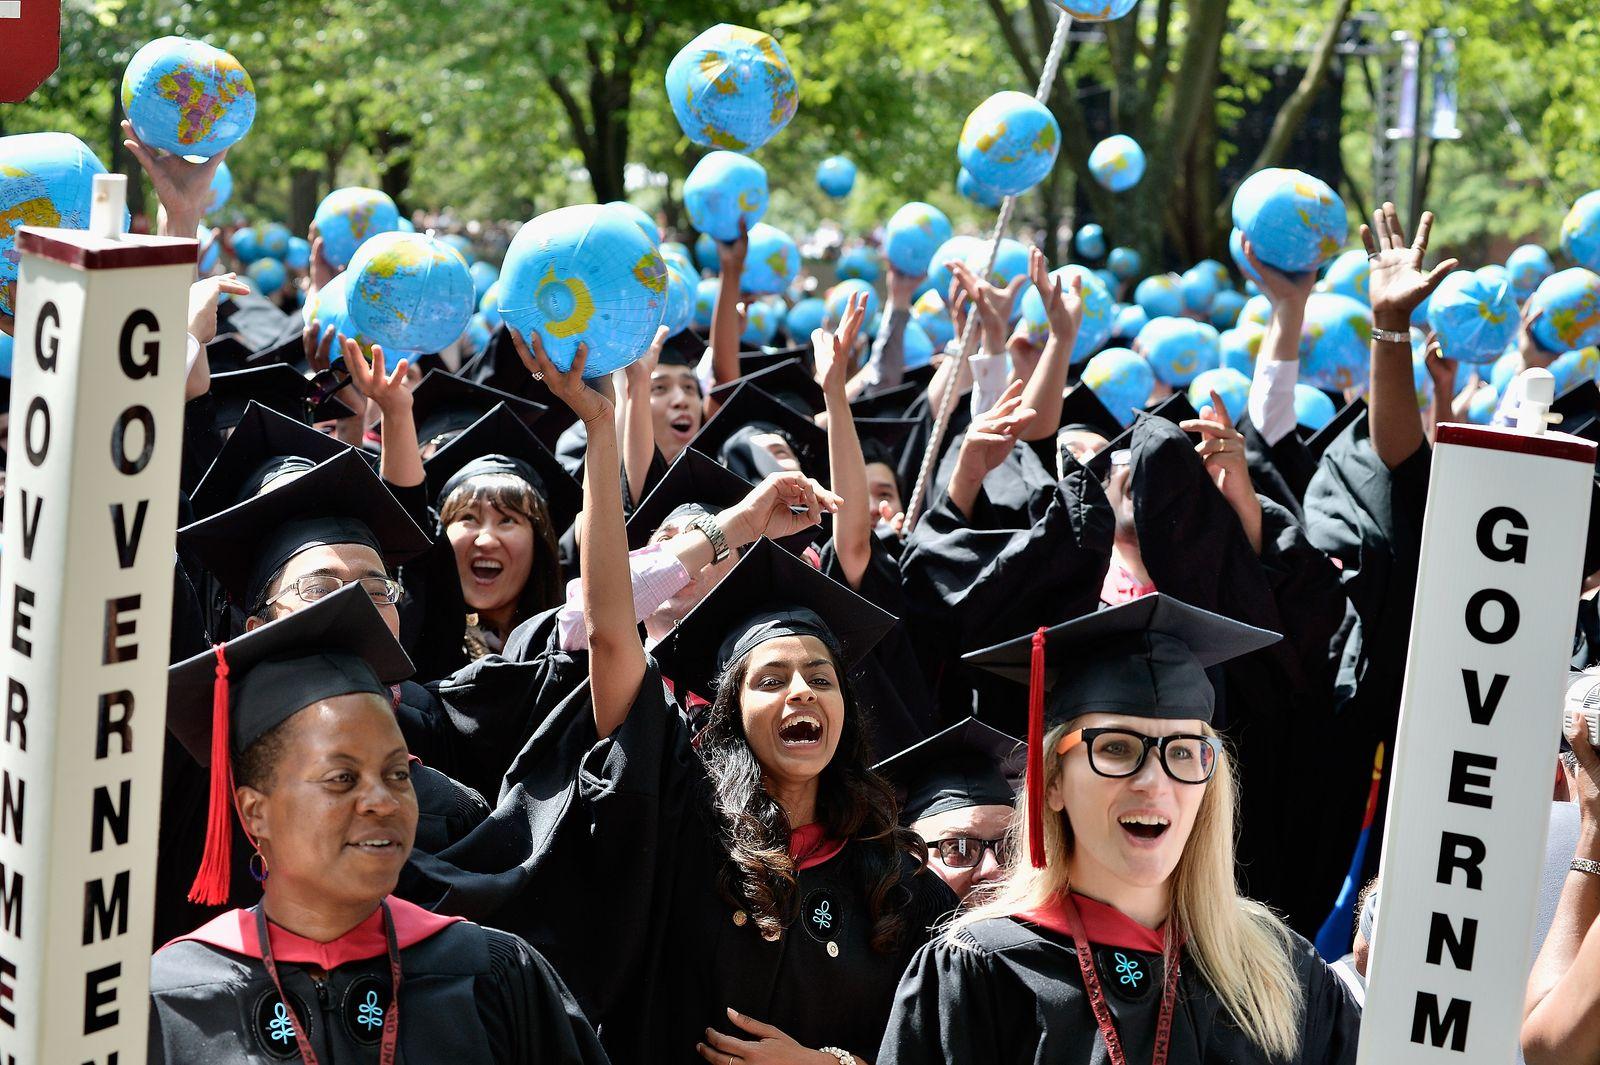 Harvard University 2015 Commencement